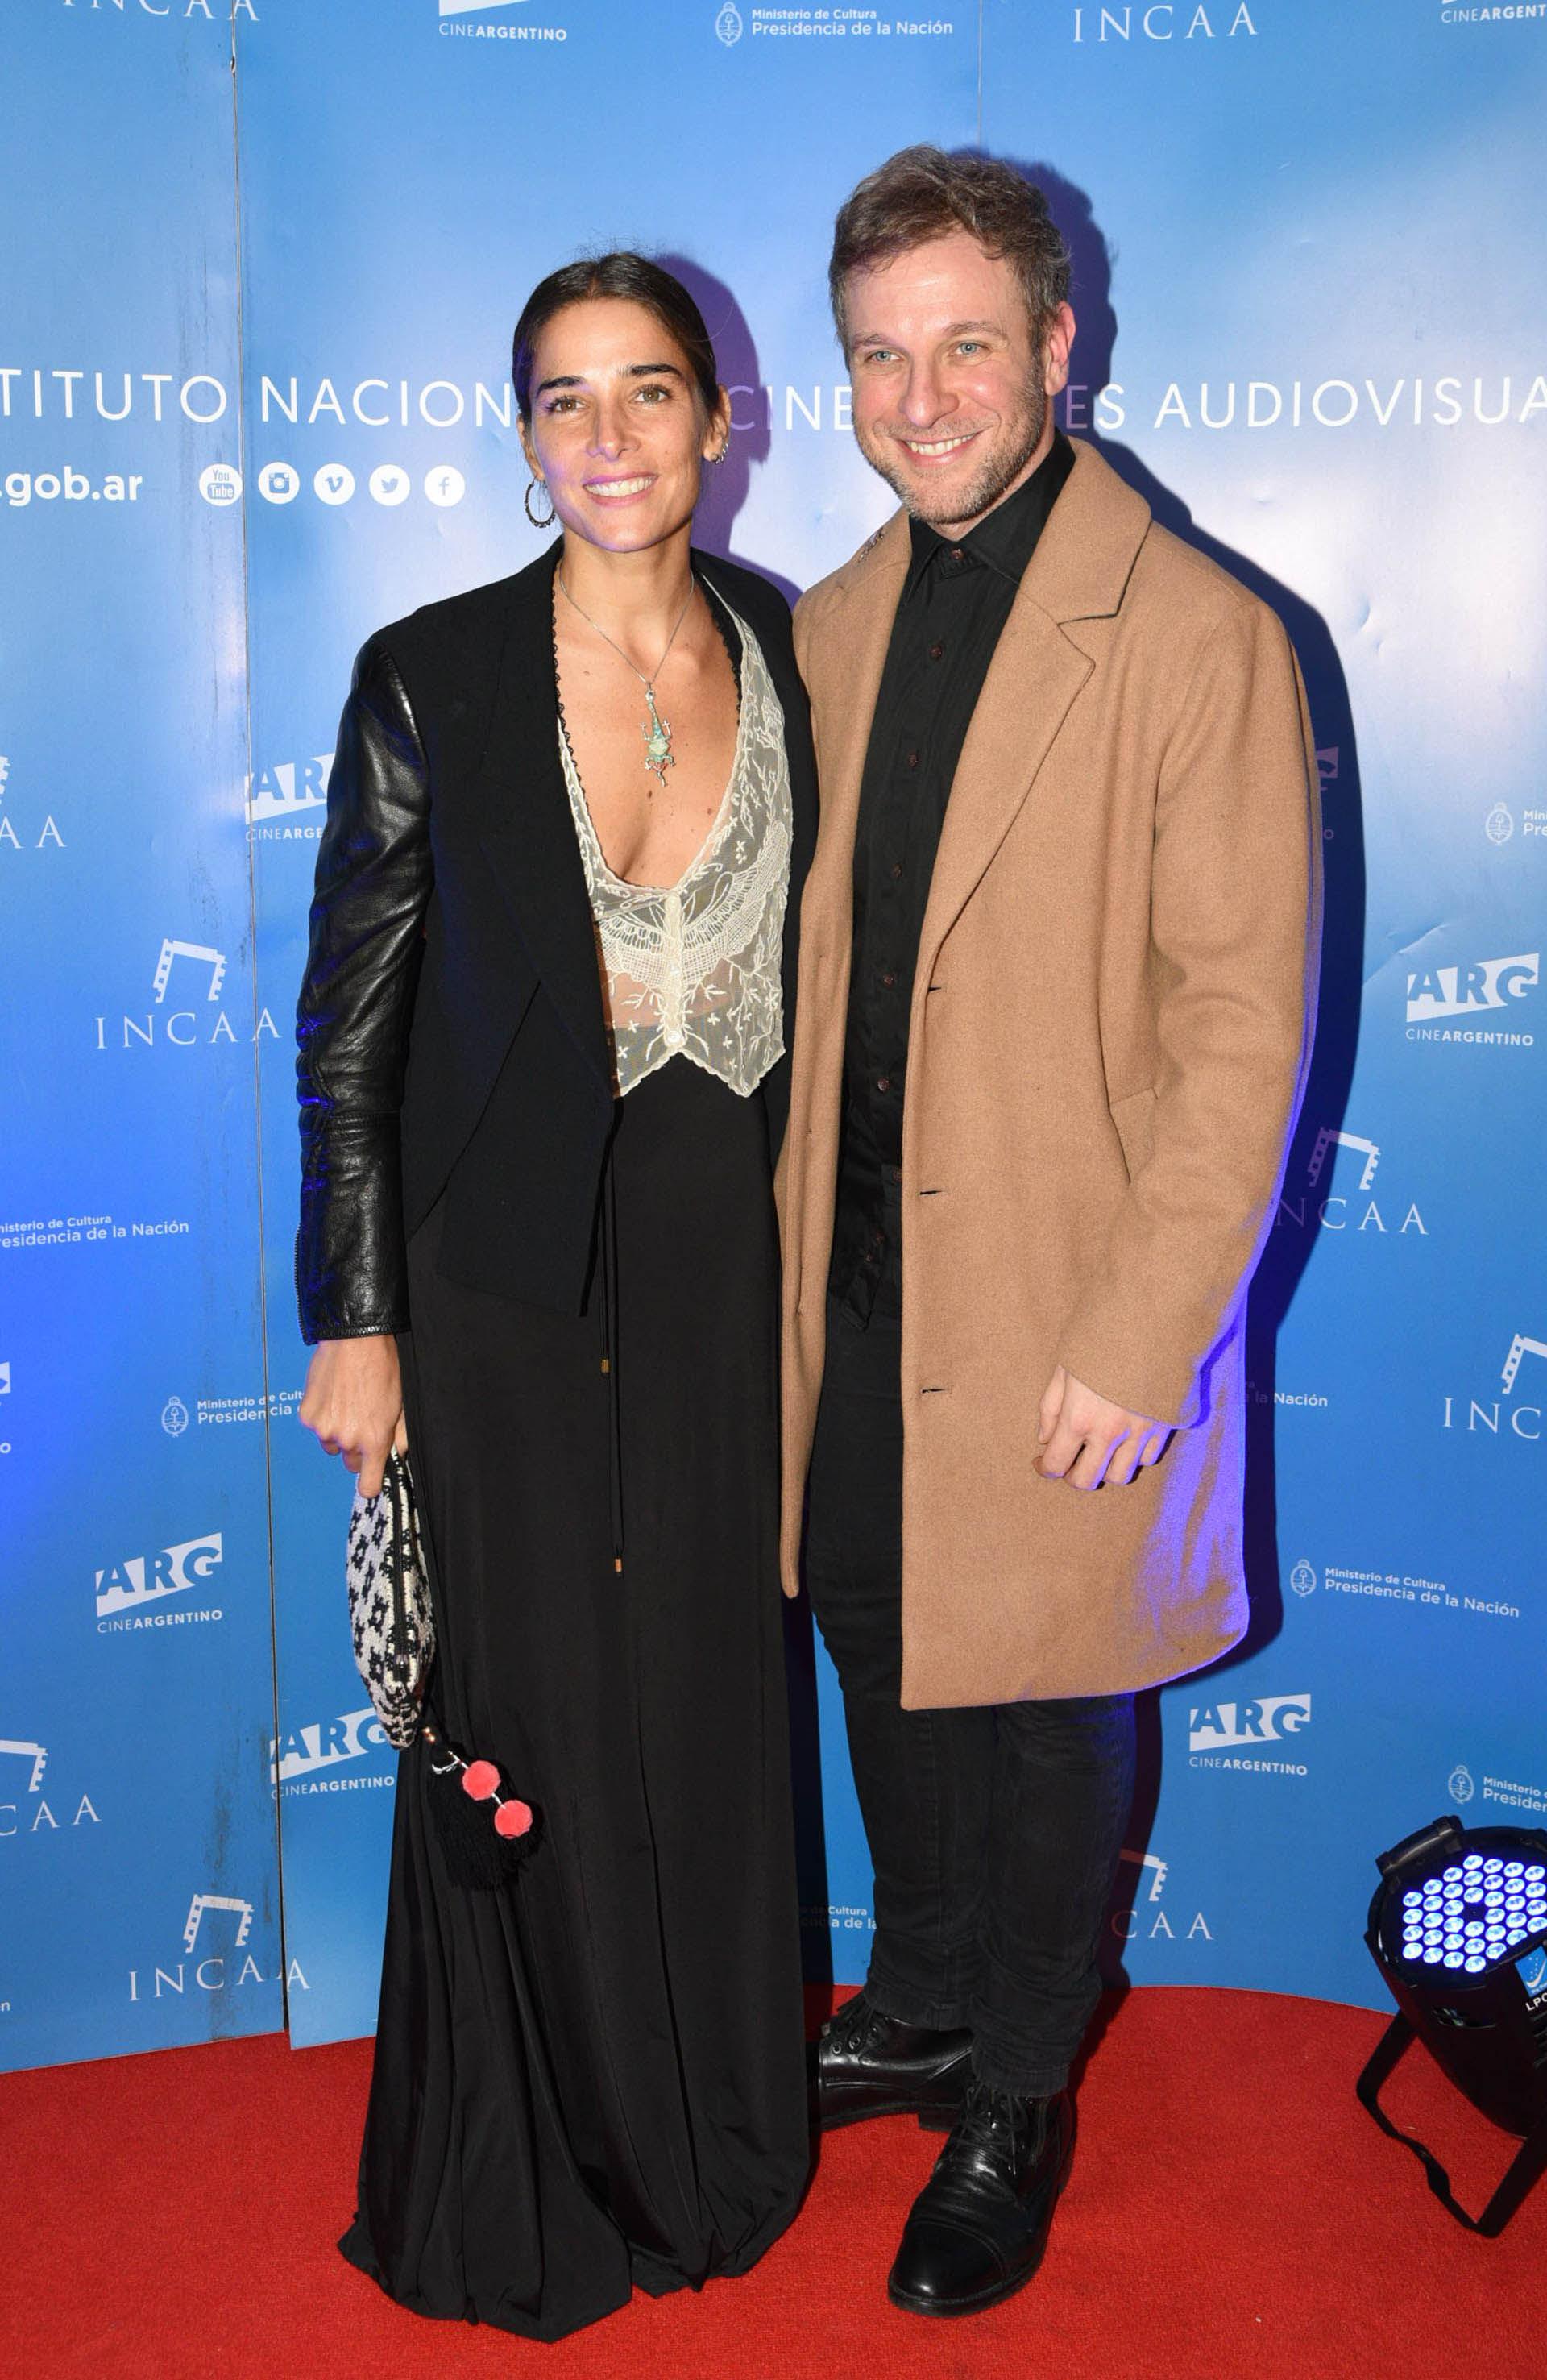 Juana Viale y Diego Gentile